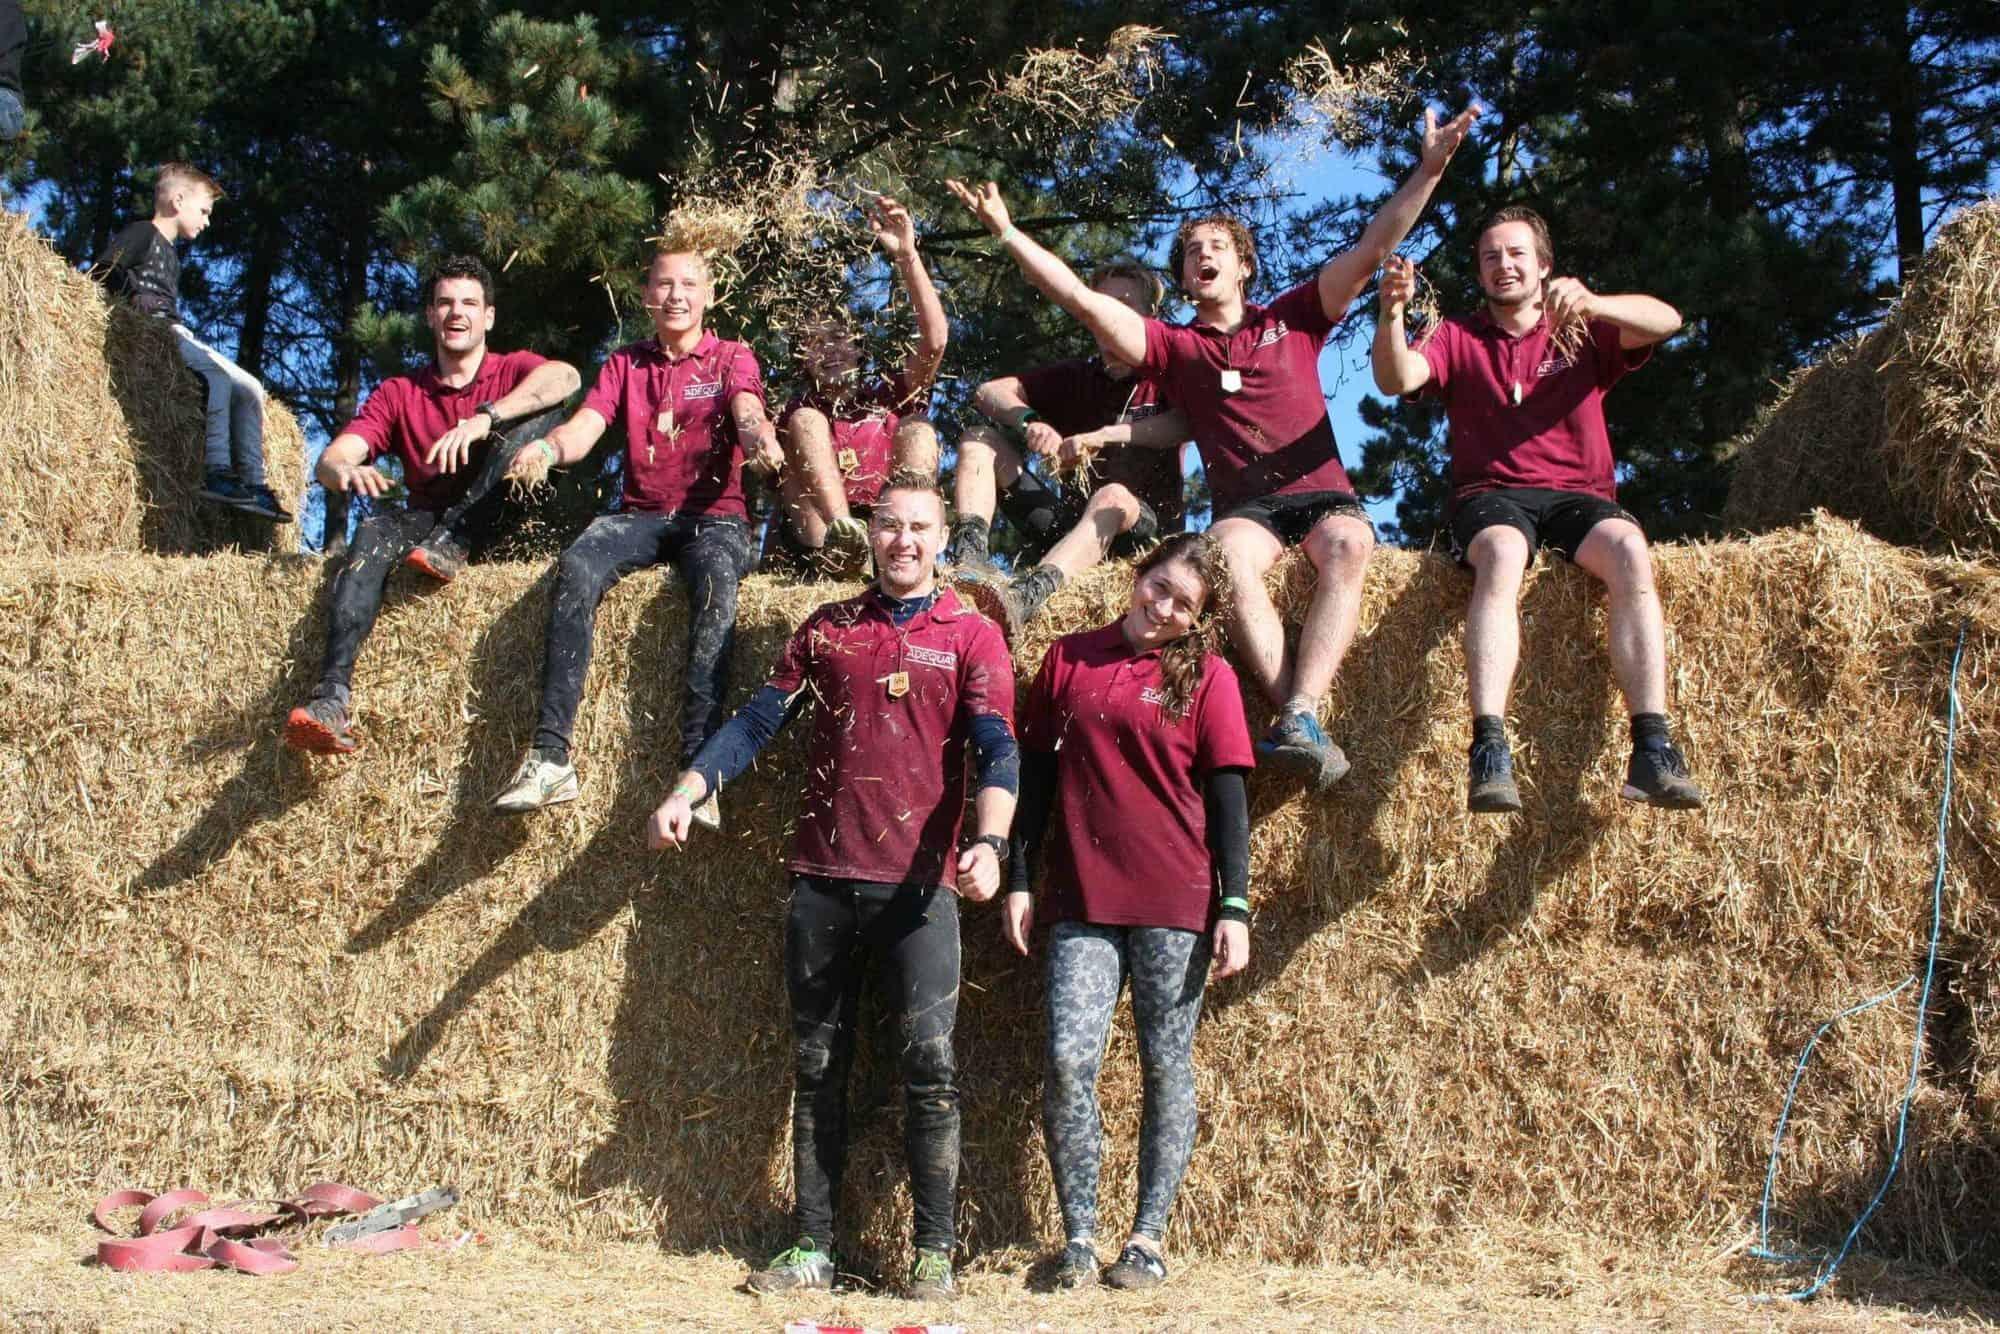 Adéquat, een ijzersterk team op de Musclerun 2016!